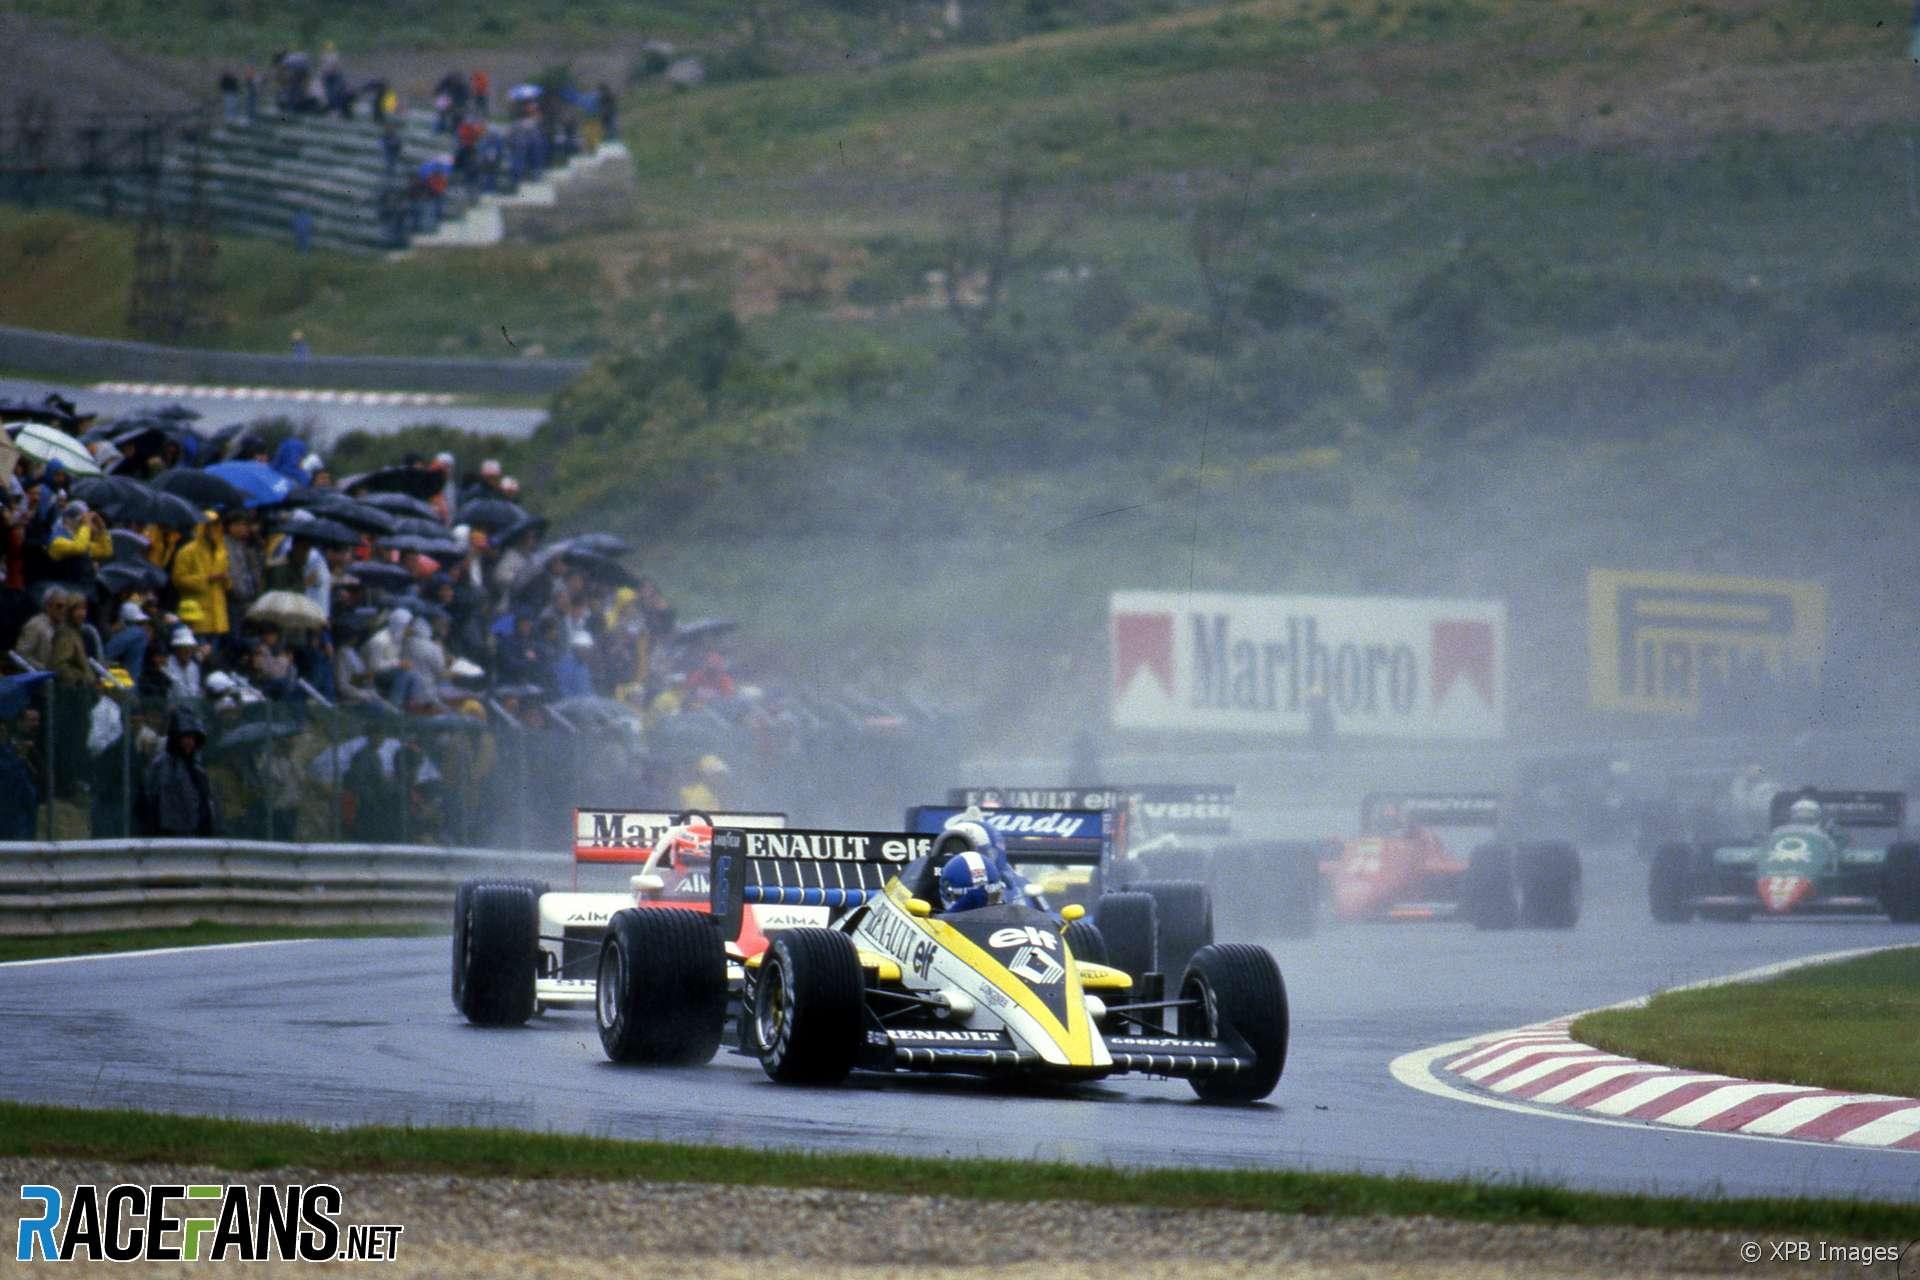 Derek Warwick, Renault, Estoril, 1985